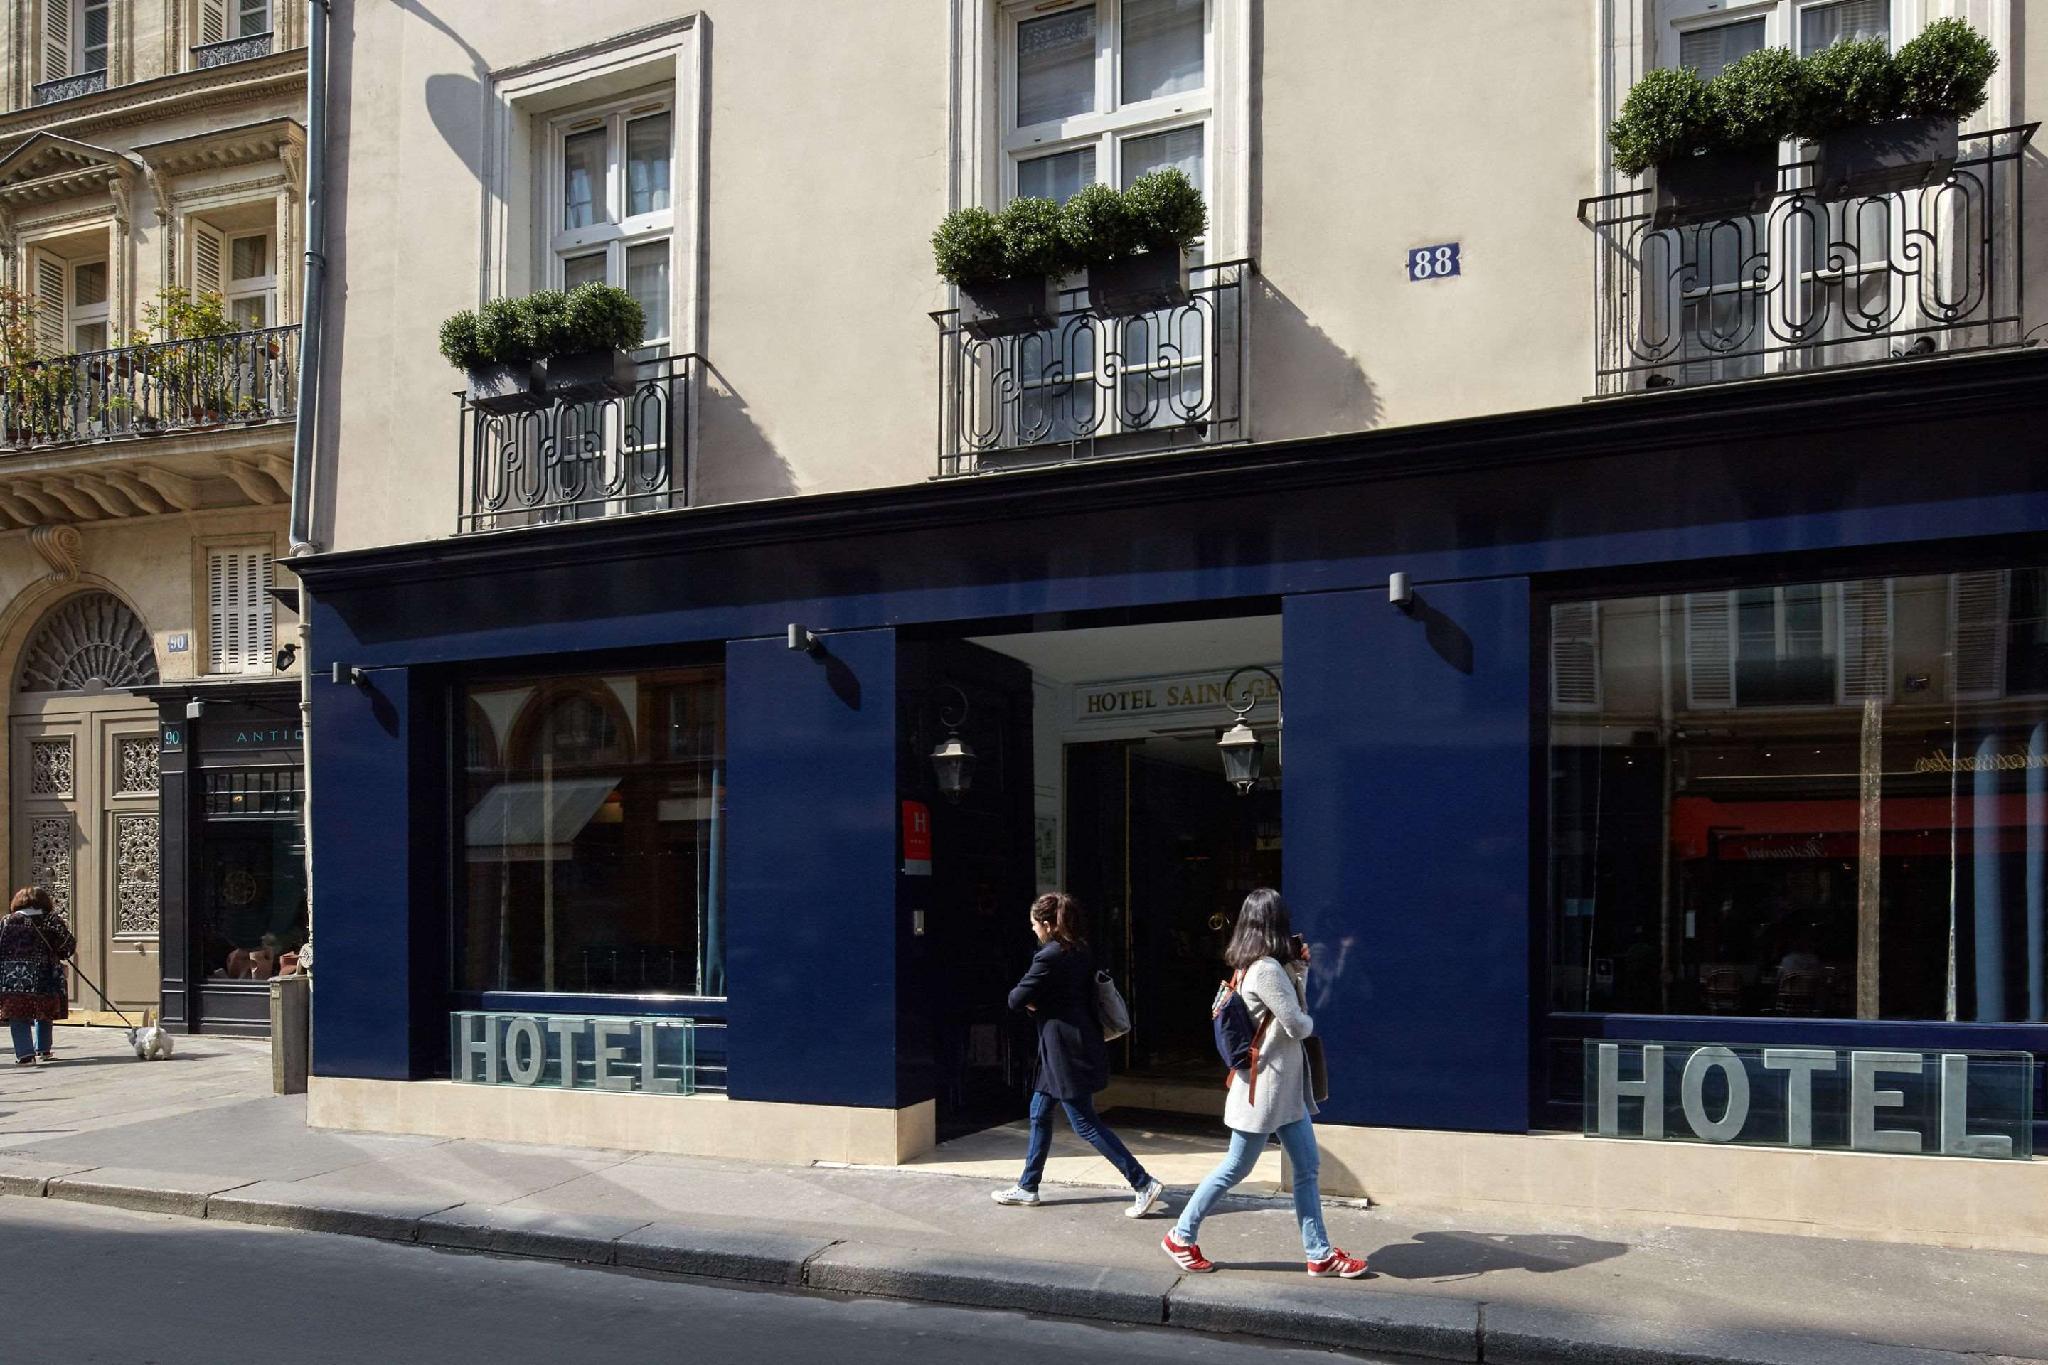 Hotel Saint Germain